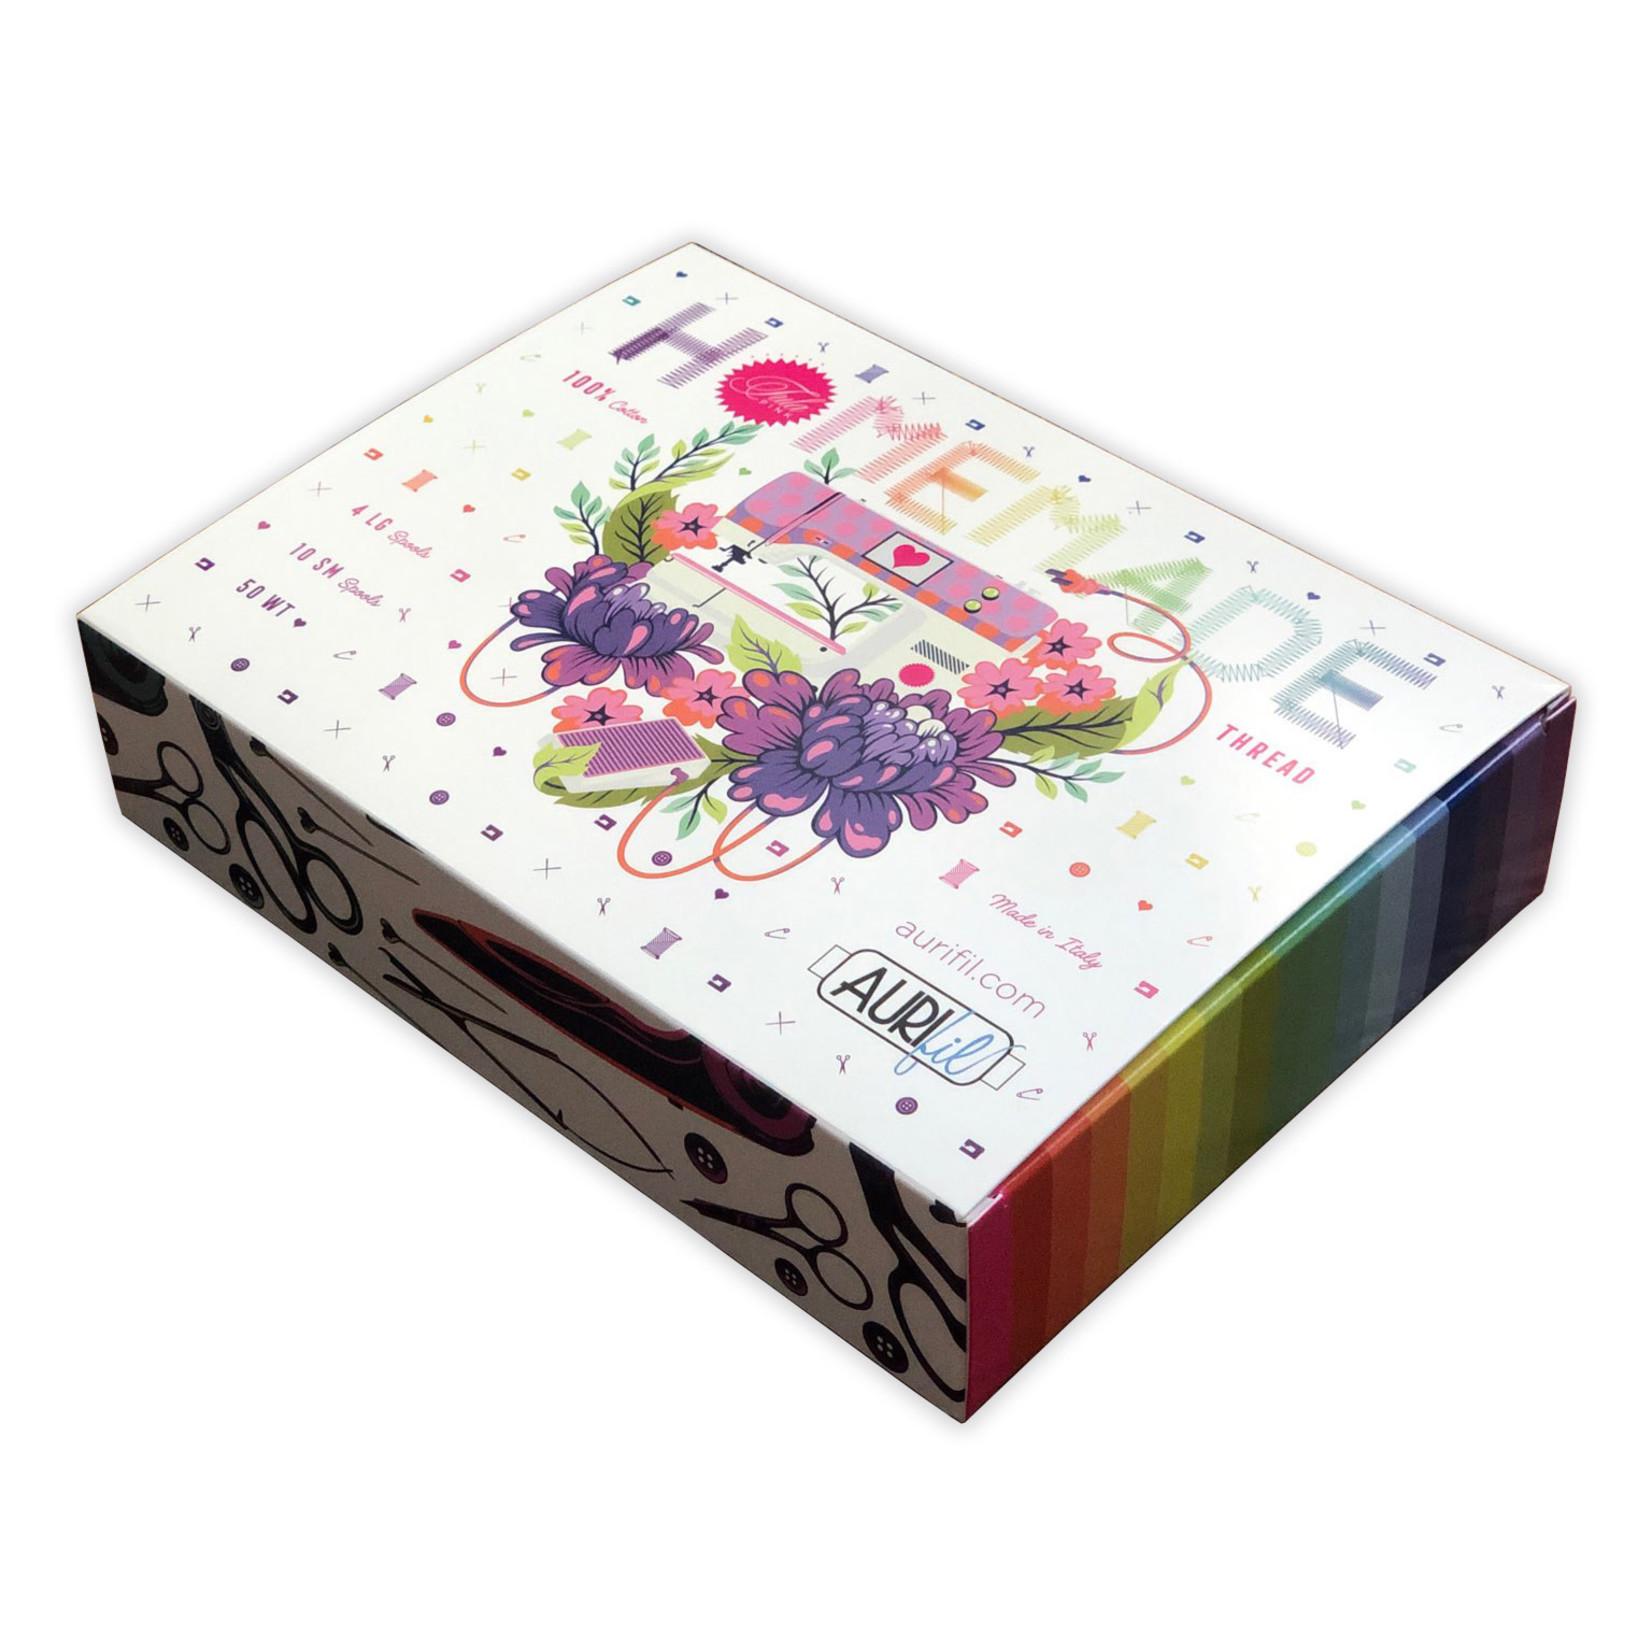 Tula Pink HomeMade Thread Collection - Aurifil